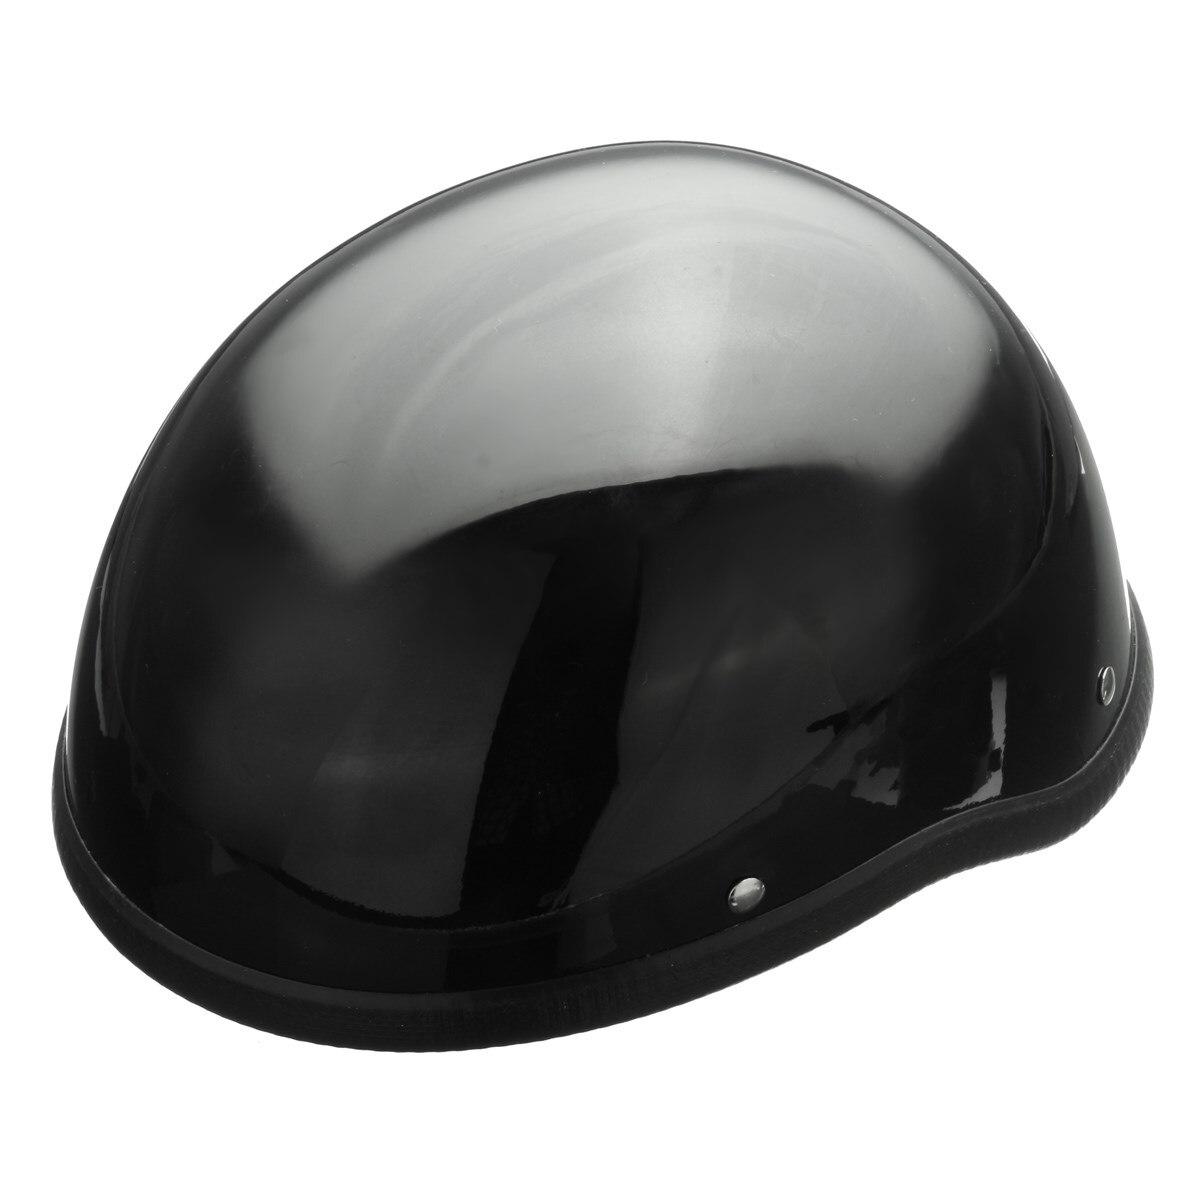 NEW ABS Gloss 55-60cm Black Motorcycle Safety Half Helmet Open Face Chopper Skull Cap Biker Pilot Cruiser new tk chinese military air force jet pilot open face motorcycle black helmet